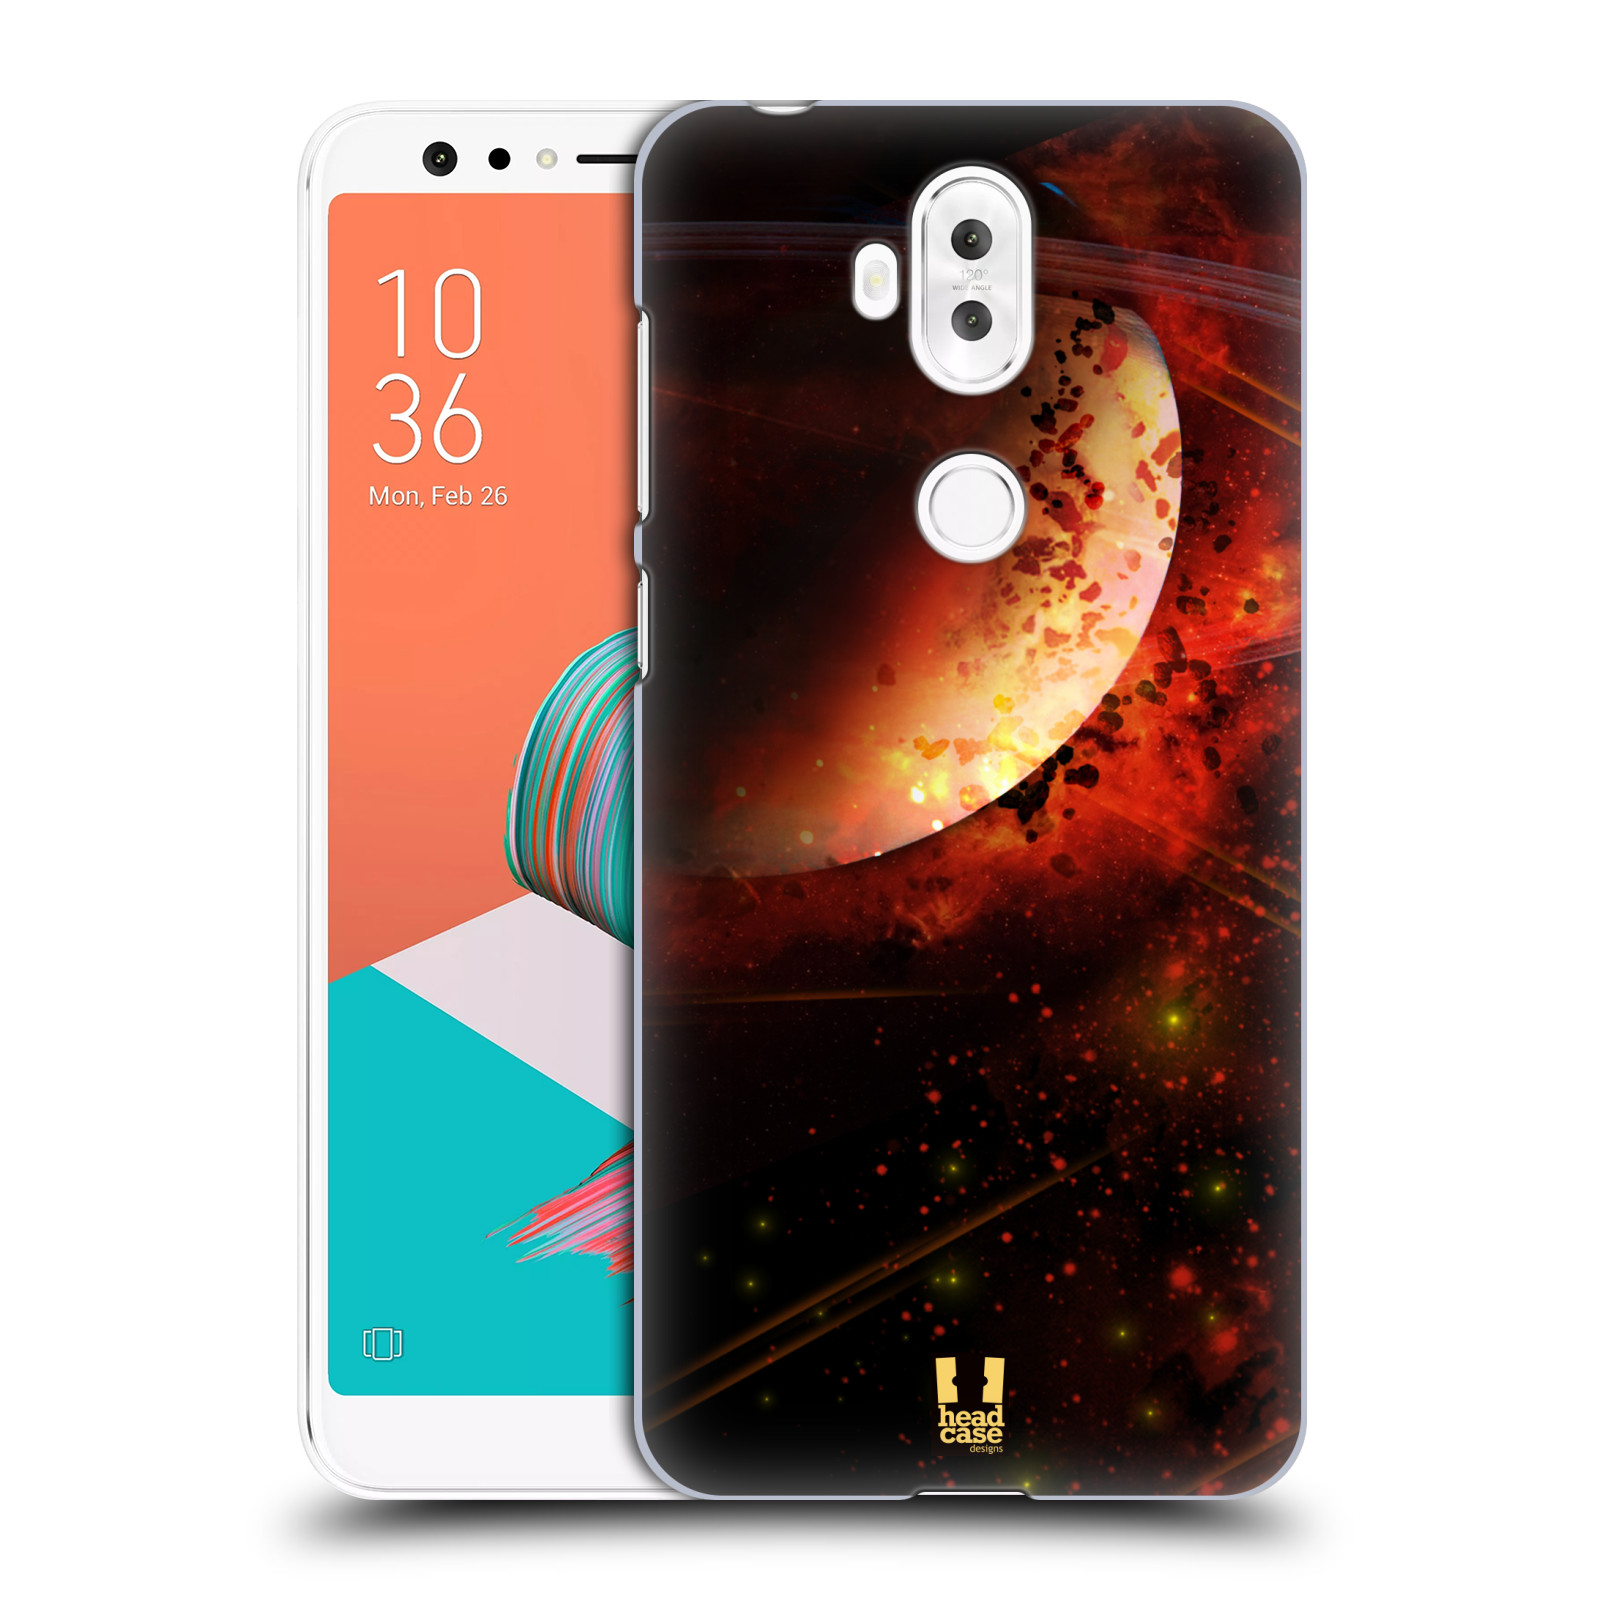 Plastové pouzdro na mobil Asus ZenFone 5 Lite ZC600KL - Head Case - SATURN (Plastový kryt či obal na mobilní telefon Asus ZenFone 5 Lite (ZC600KL) s motivem SATURN)